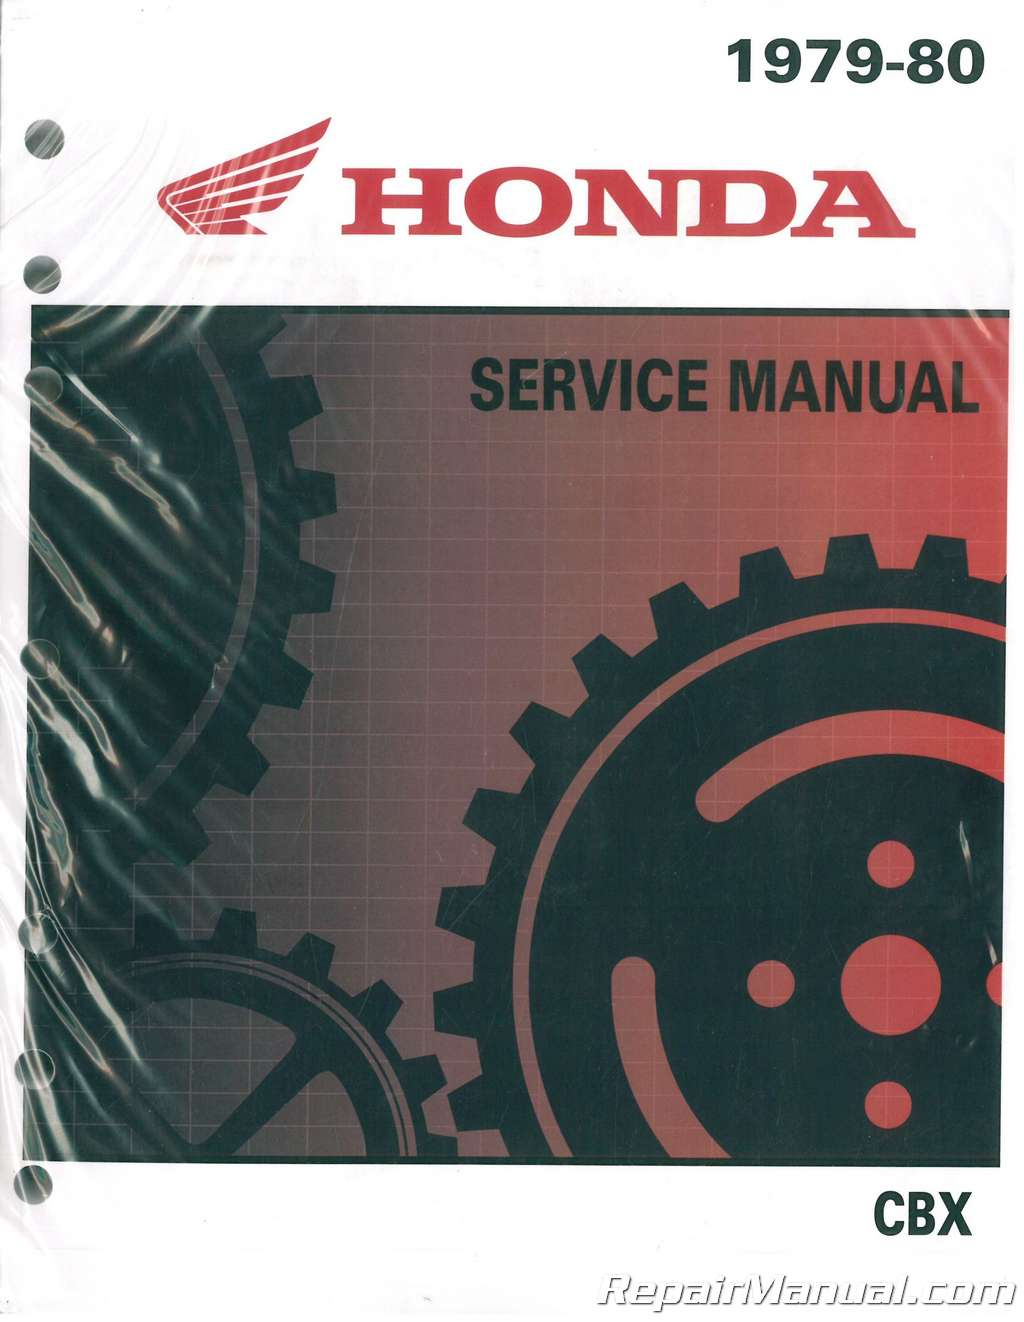 1979 1980 honda cbx1000 motorcycle service manual rh repairmanual com 2005 Honda TRX300EX 2002 Honda TRX300EX